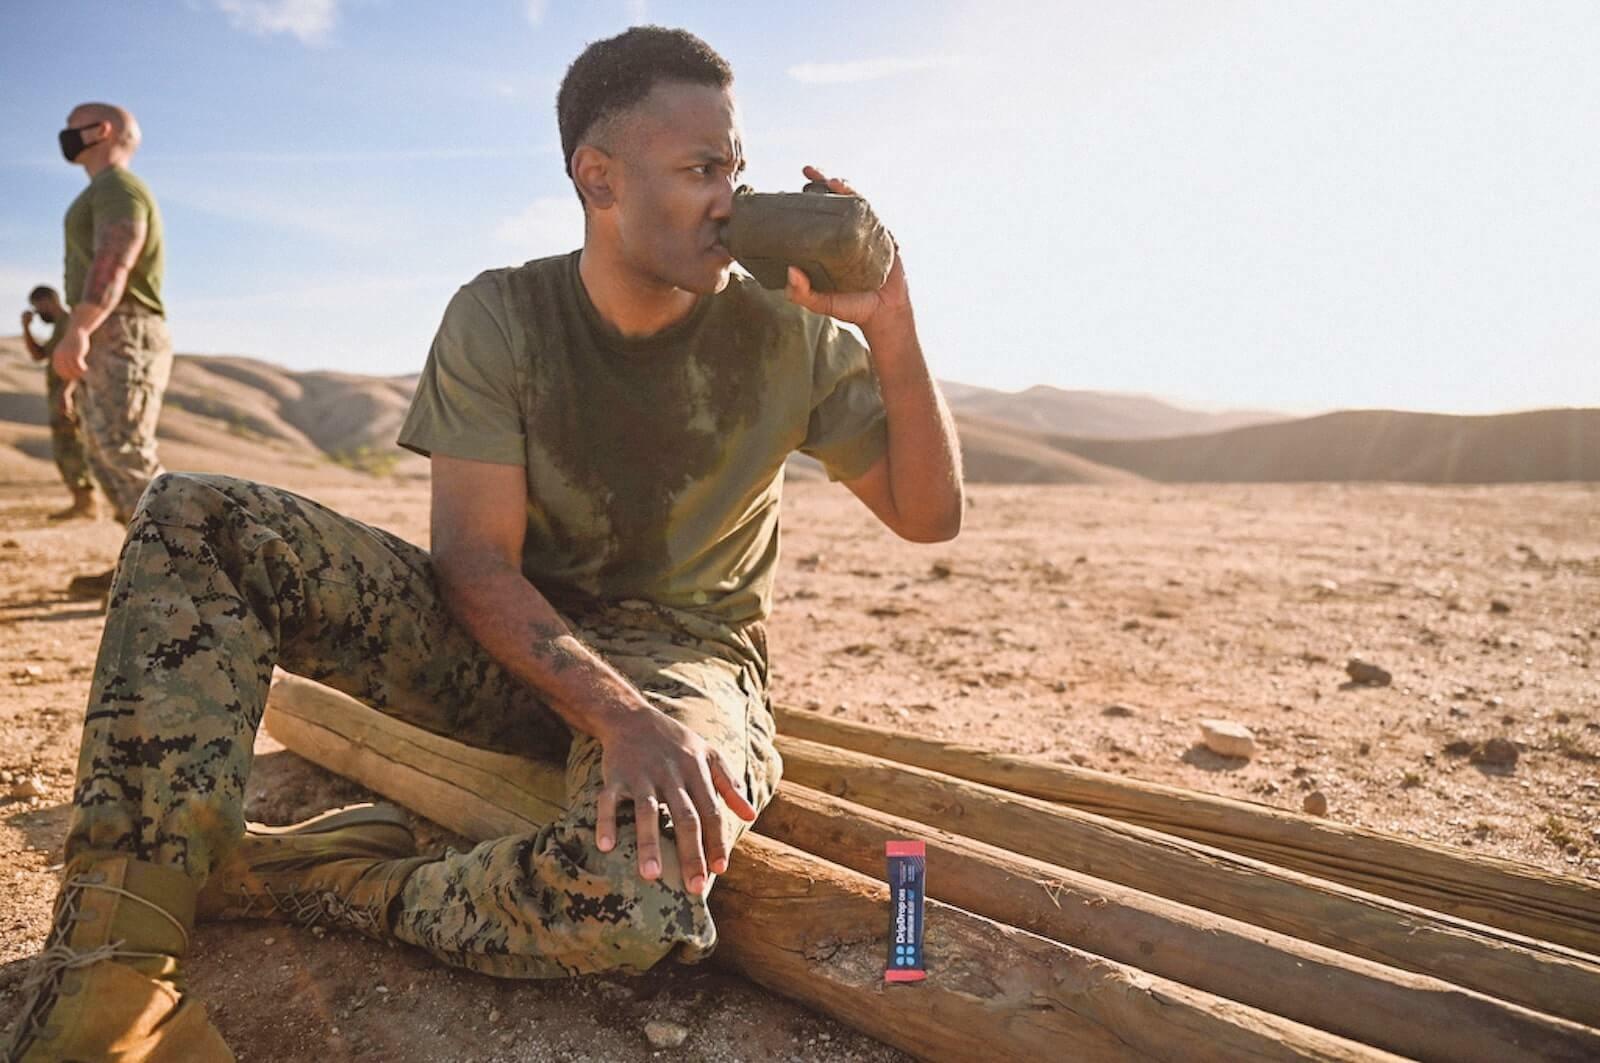 Nausea and sweating: military man drinking DripDrop ORS